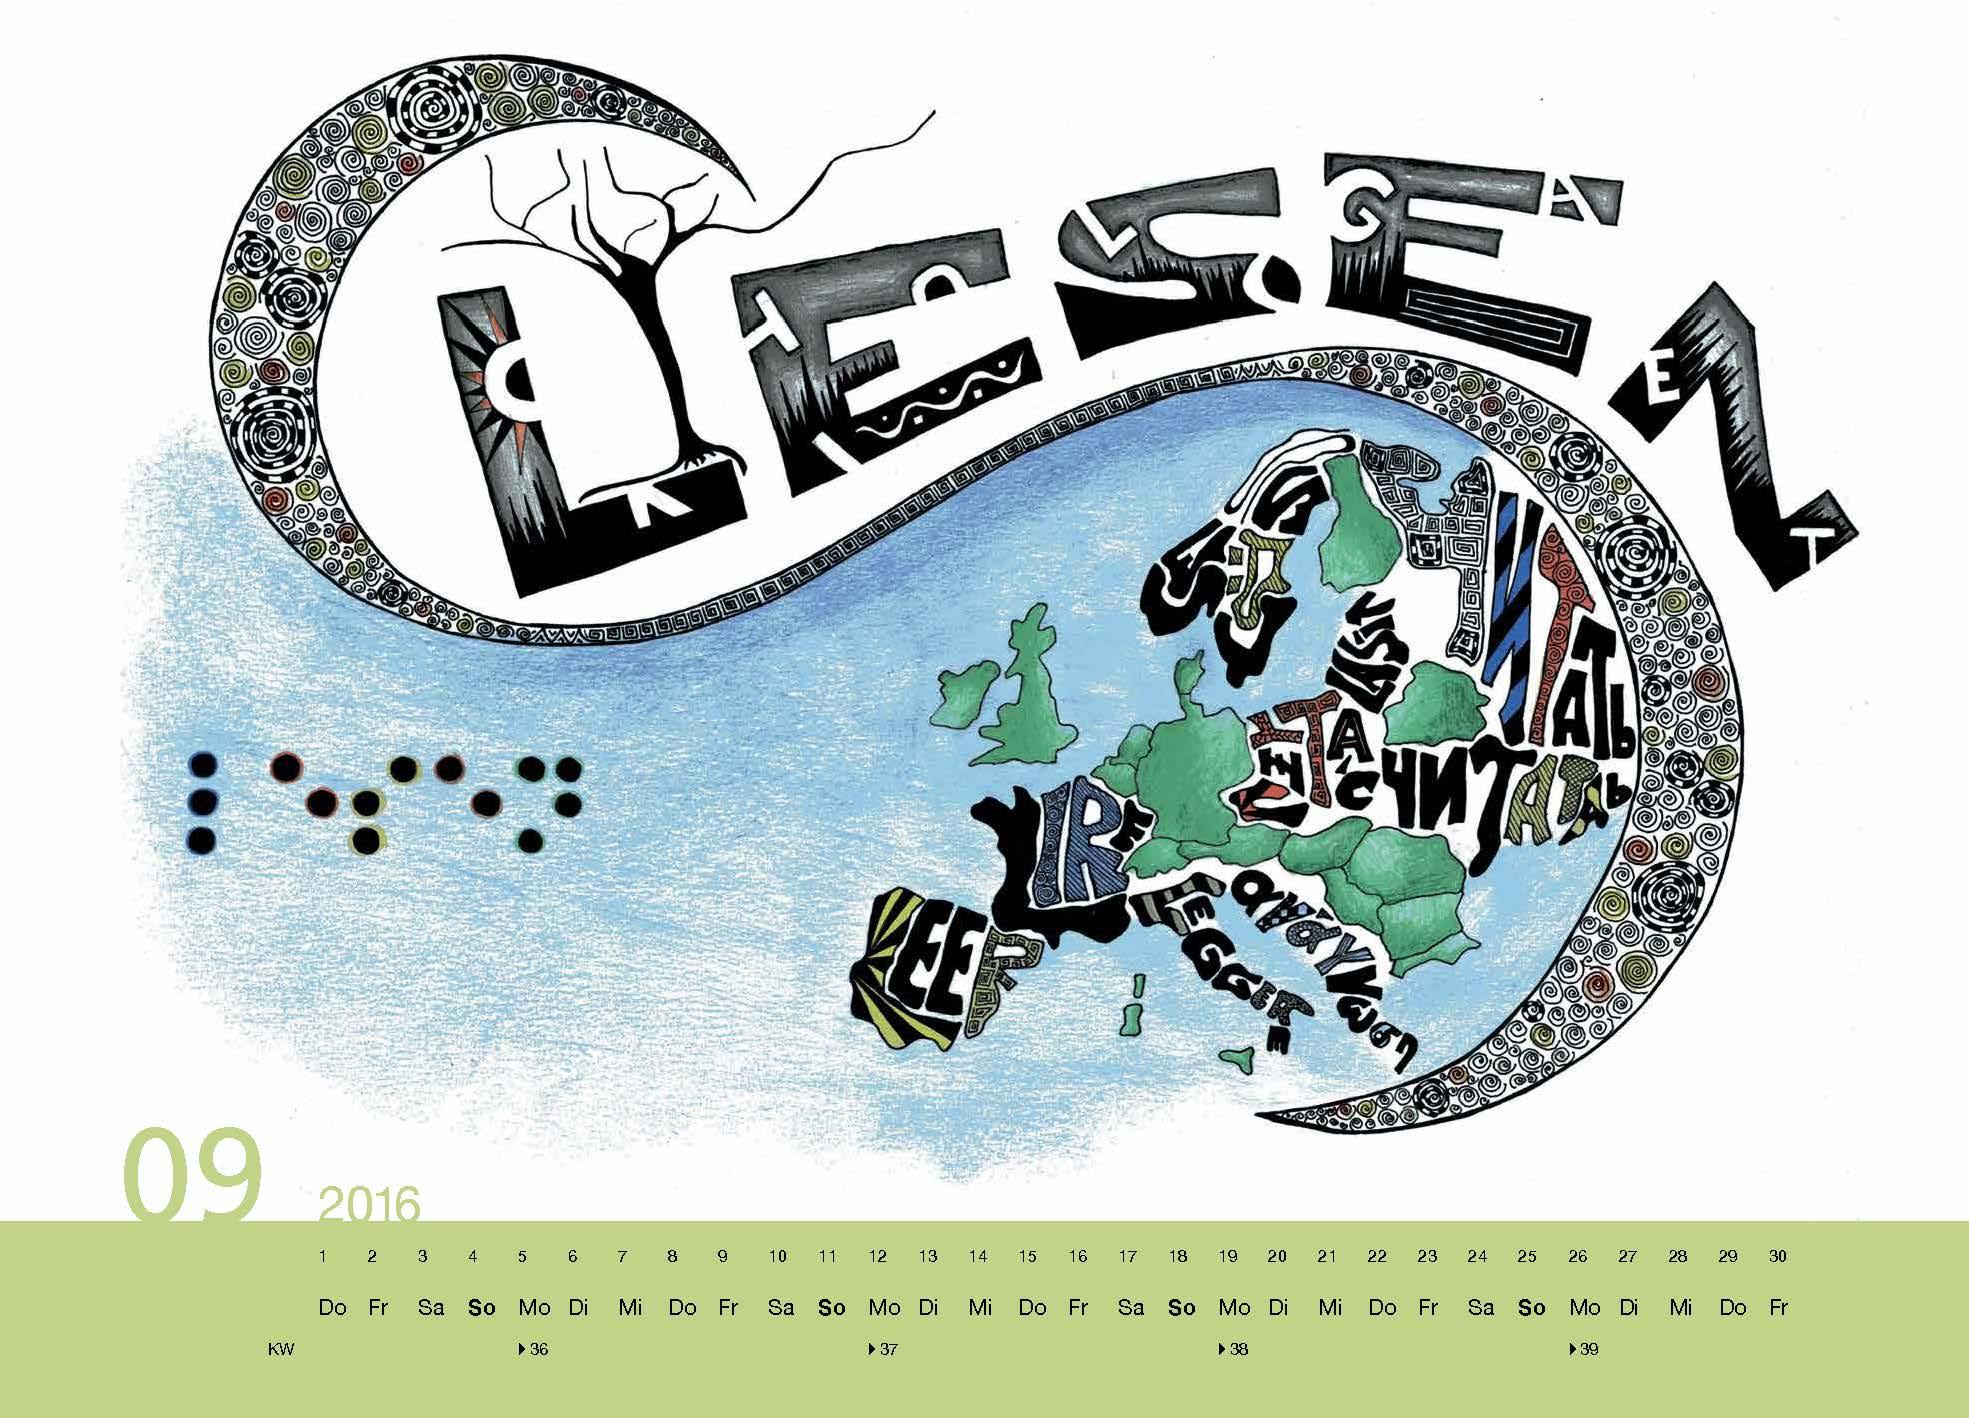 Berufskolleg f r grafik design ulm kalender 2016 for Berufskolleg grafik design